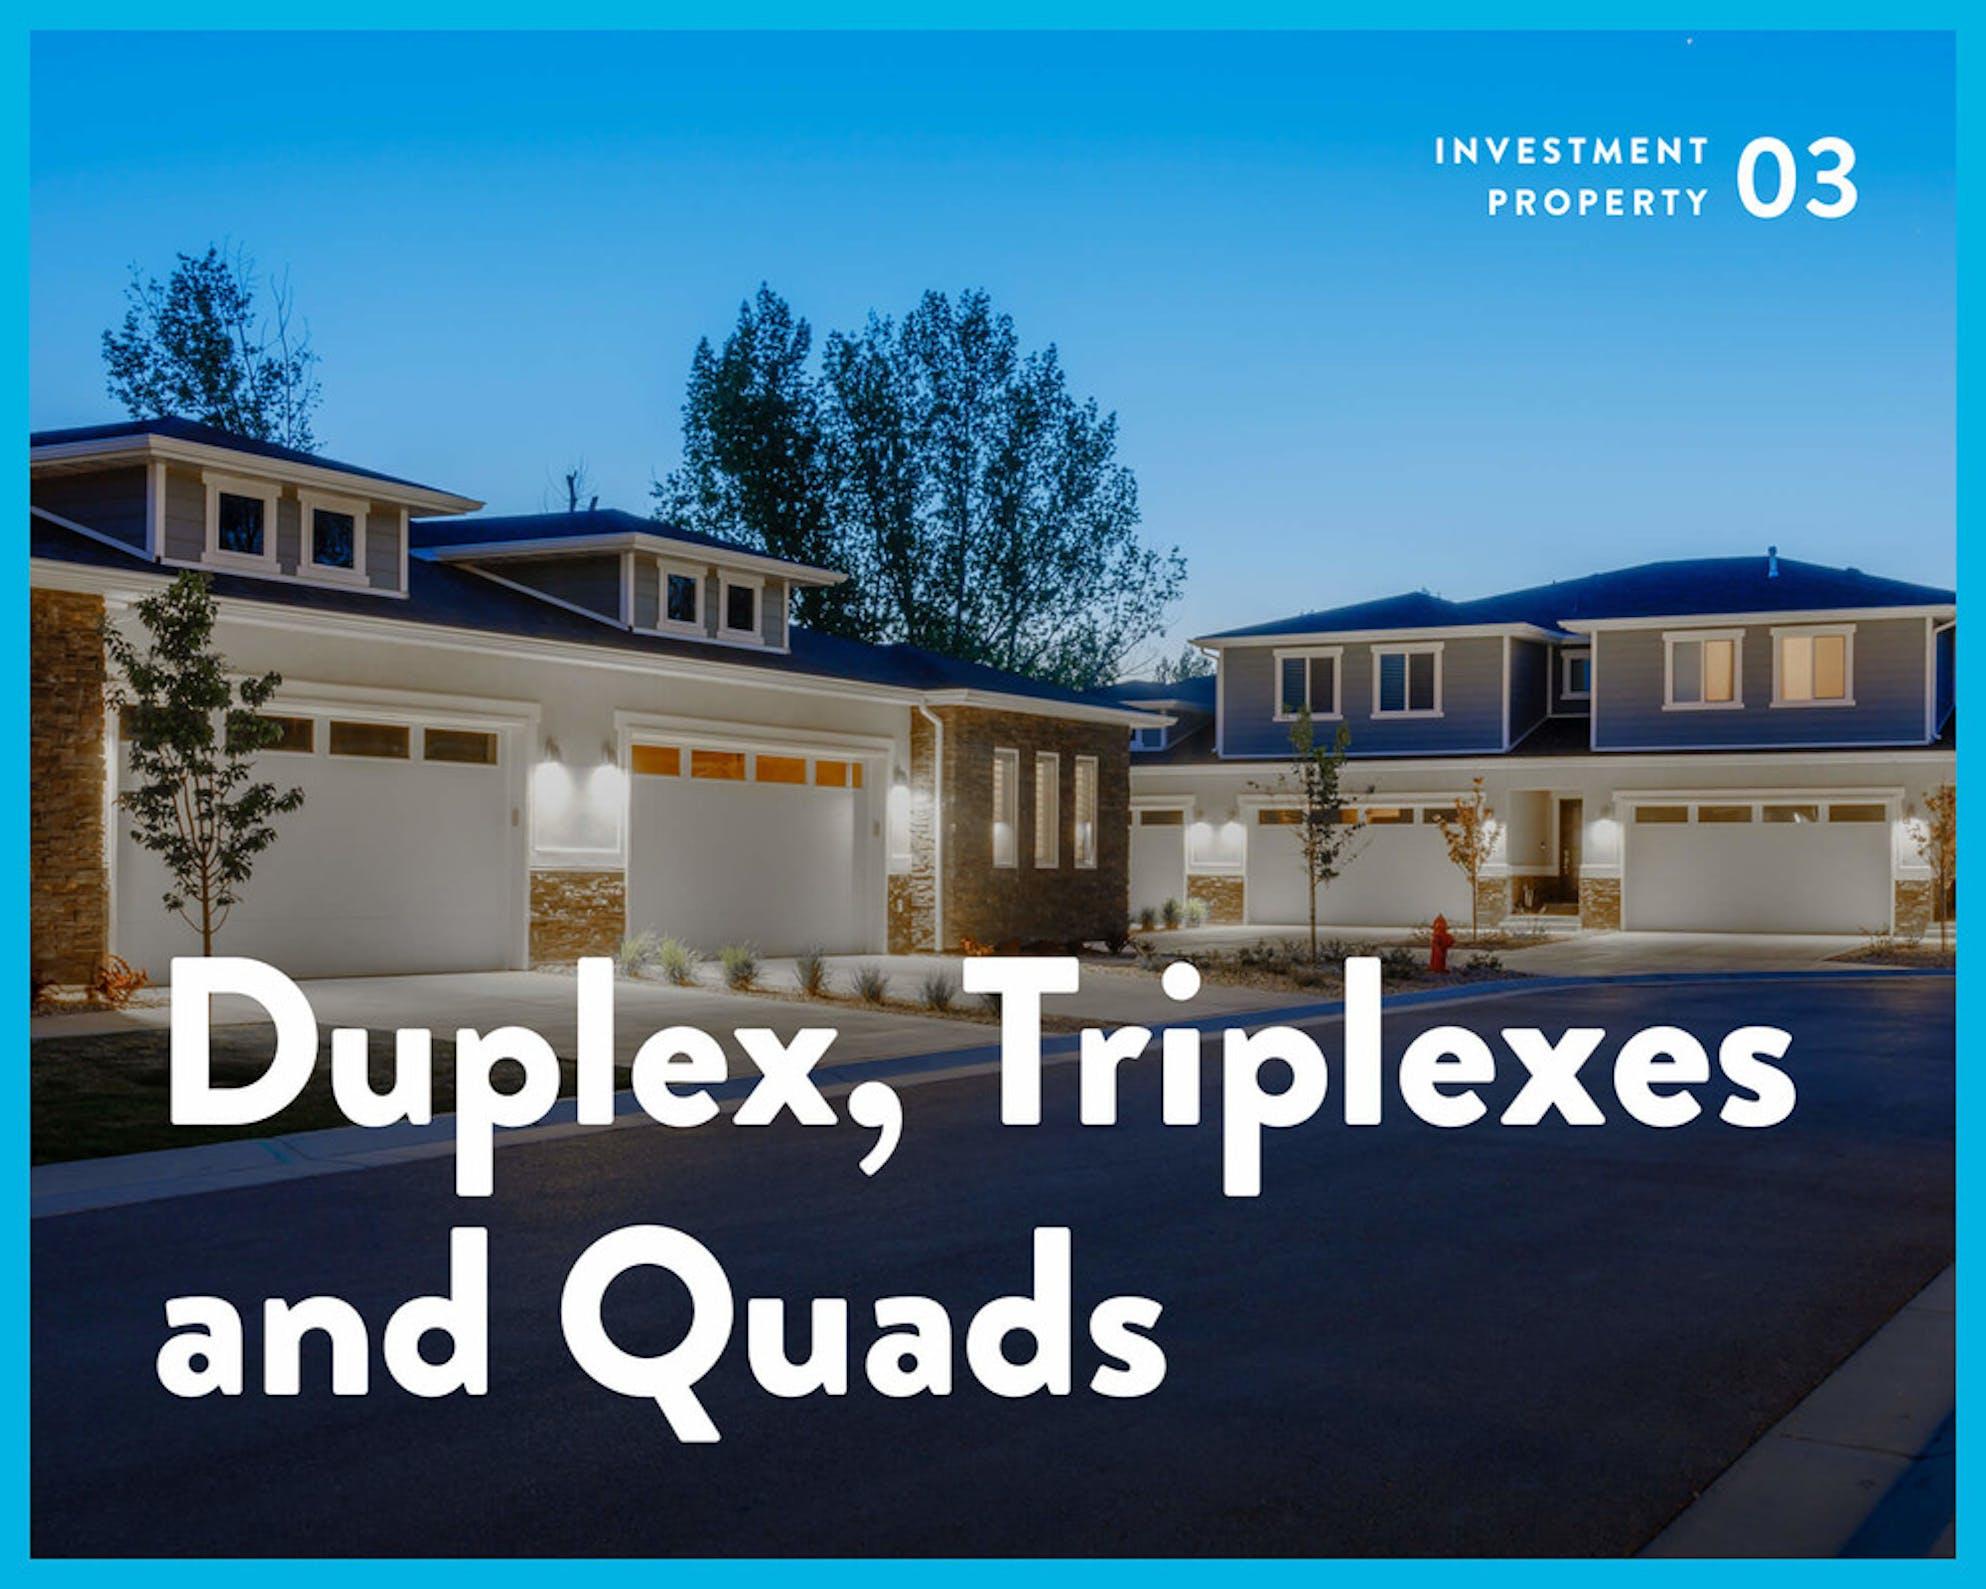 Real estate investing - duplex, triplex and quads